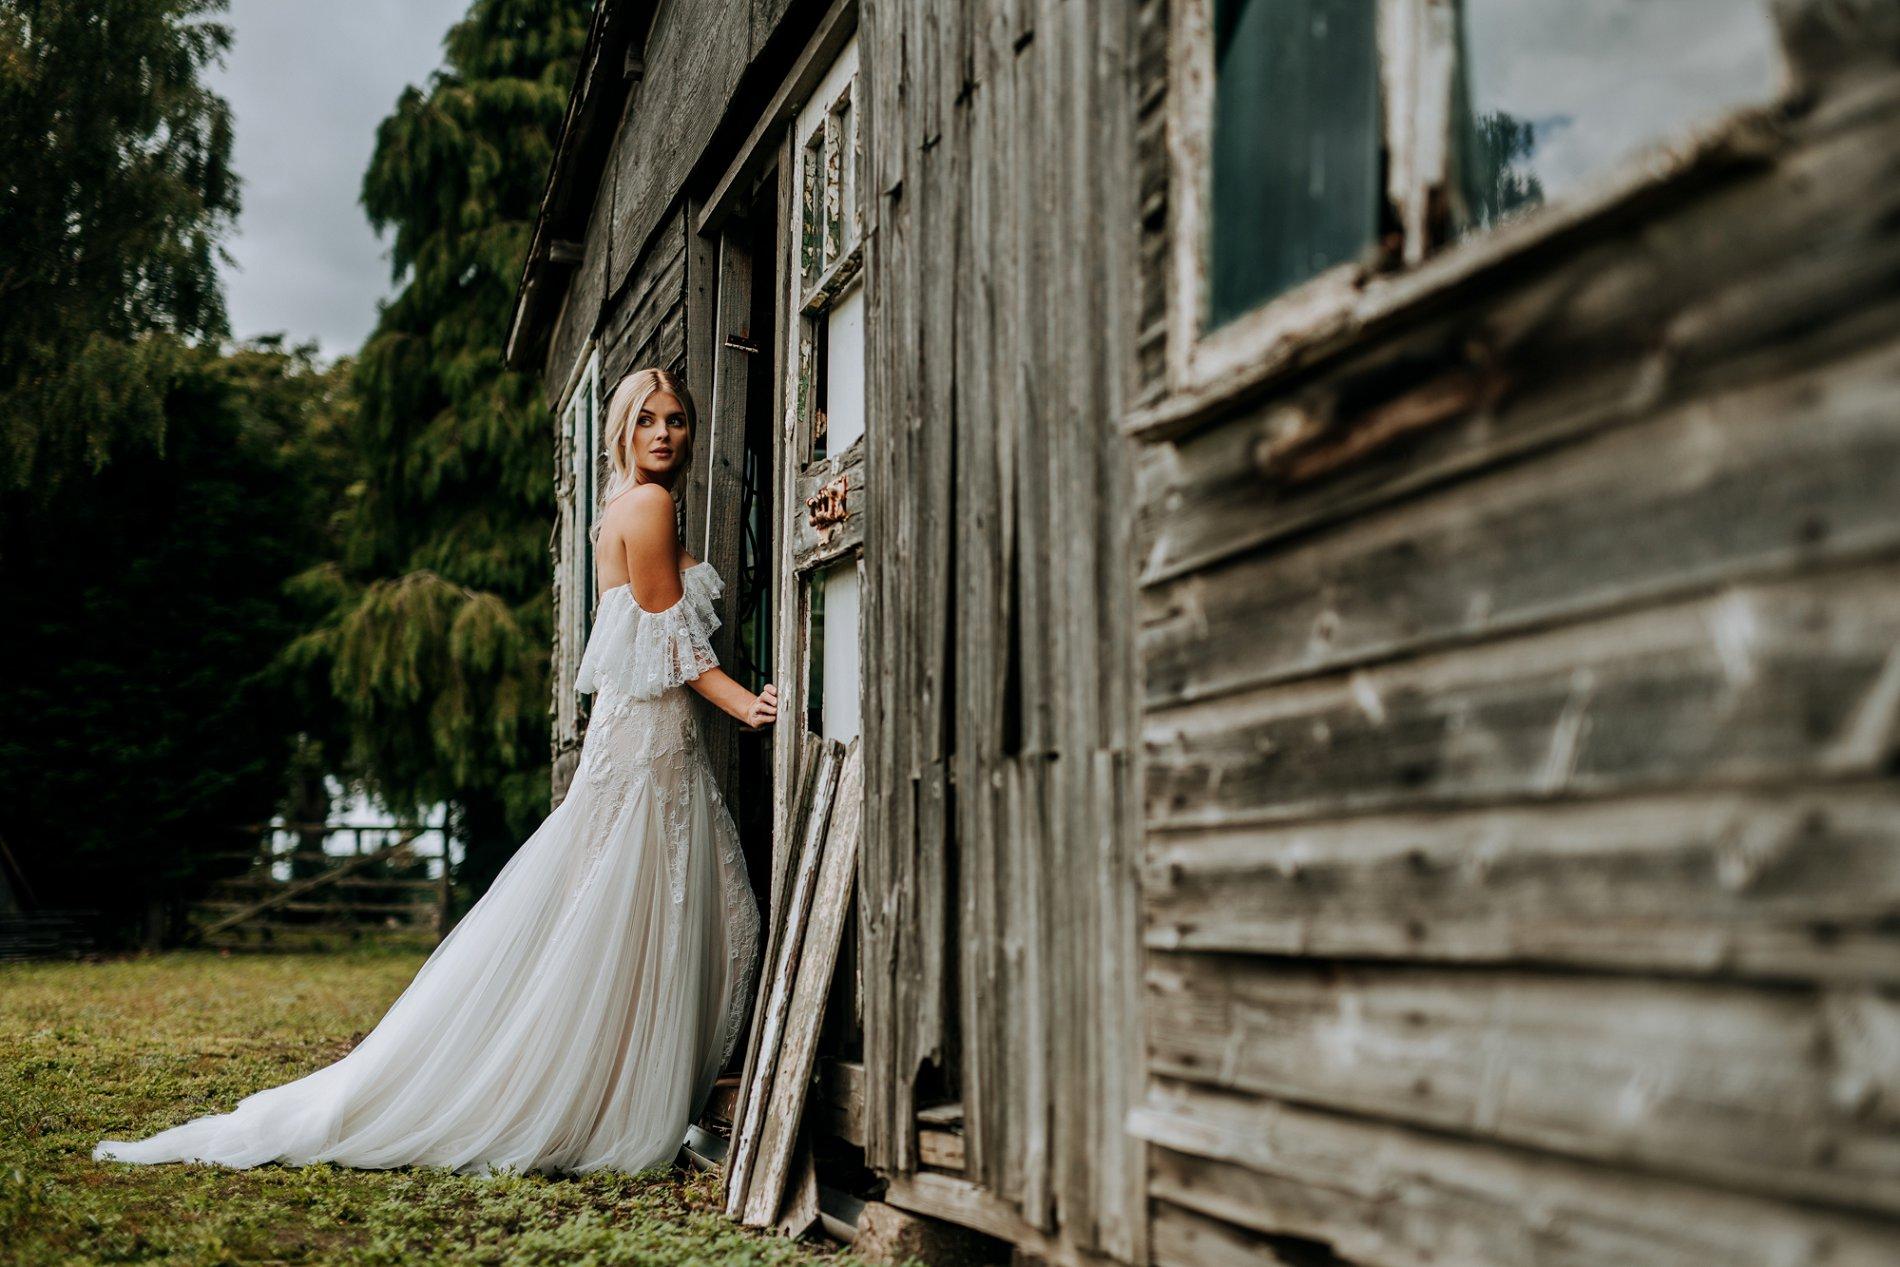 A Creative Elizabeth Lucas Bridal Fashion Editorial in Yorkshire (c) M and G Wedding Photography (17)